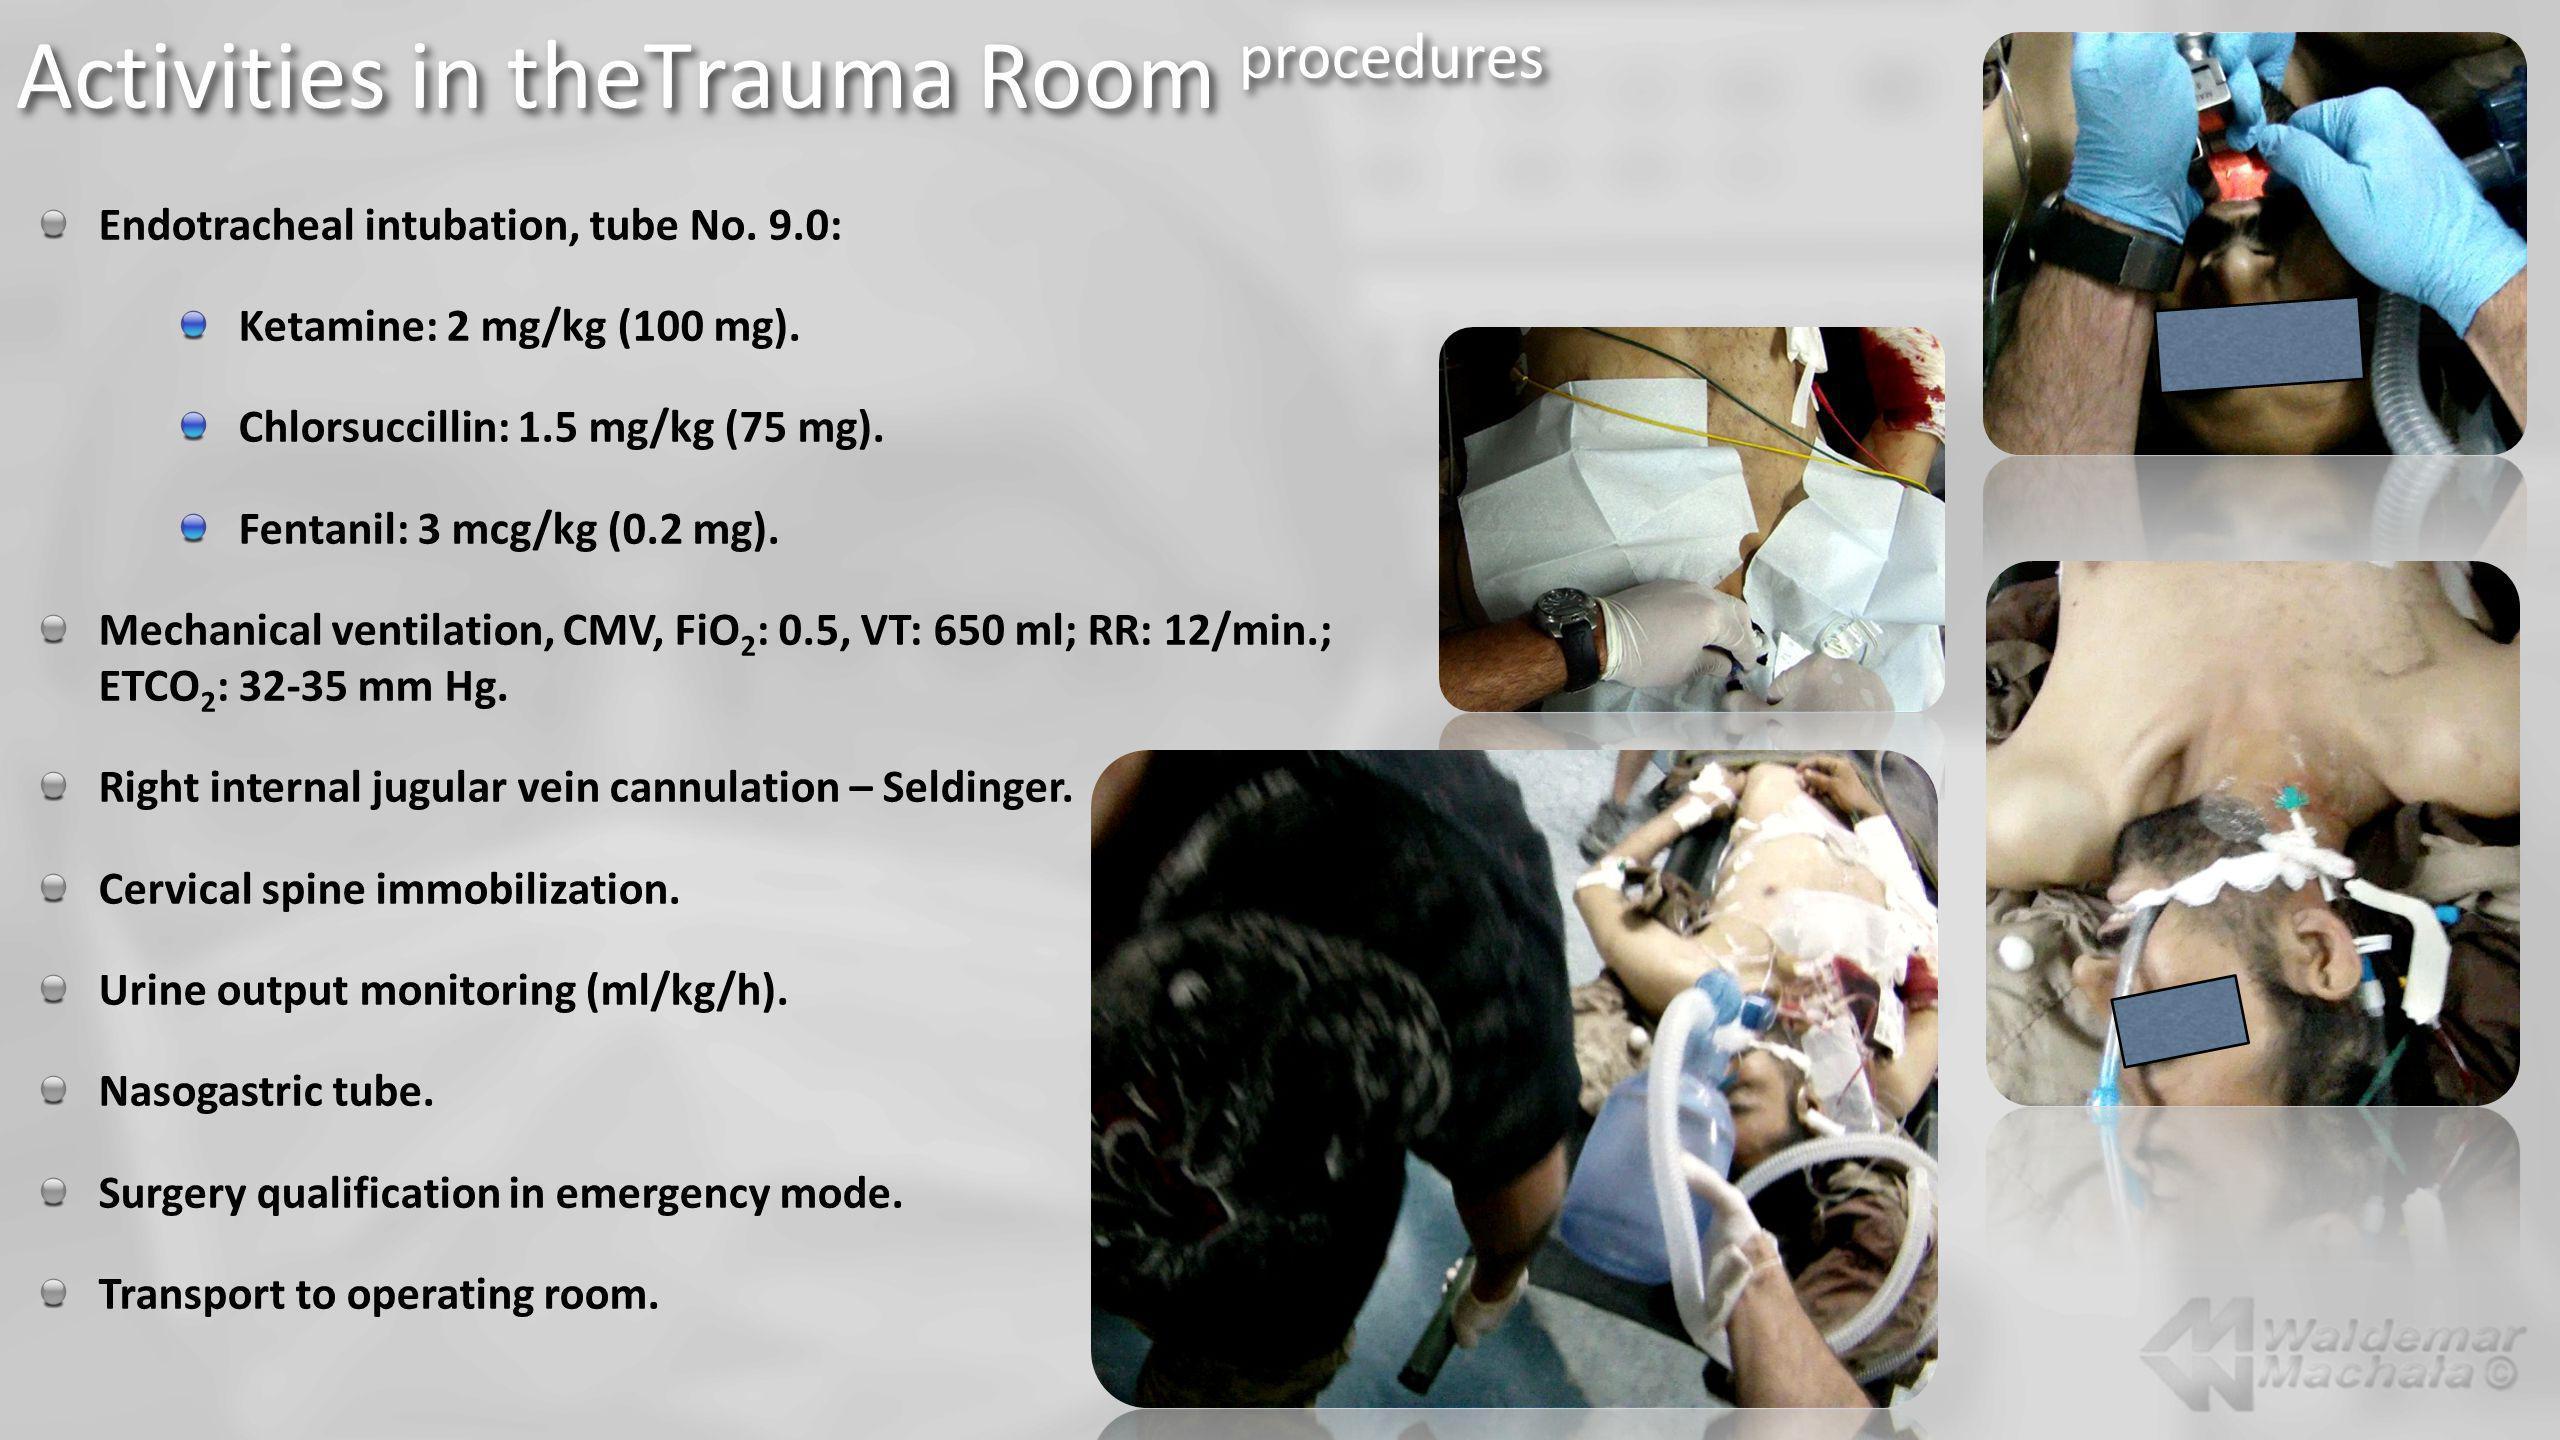 Endotracheal intubation, tube No. 9.0: Ketamine: 2 mg/kg (100 mg). Chlorsuccillin: 1.5 mg/kg (75 mg). Fentanil: 3 mcg/kg (0.2 mg). Mechanical ventilat